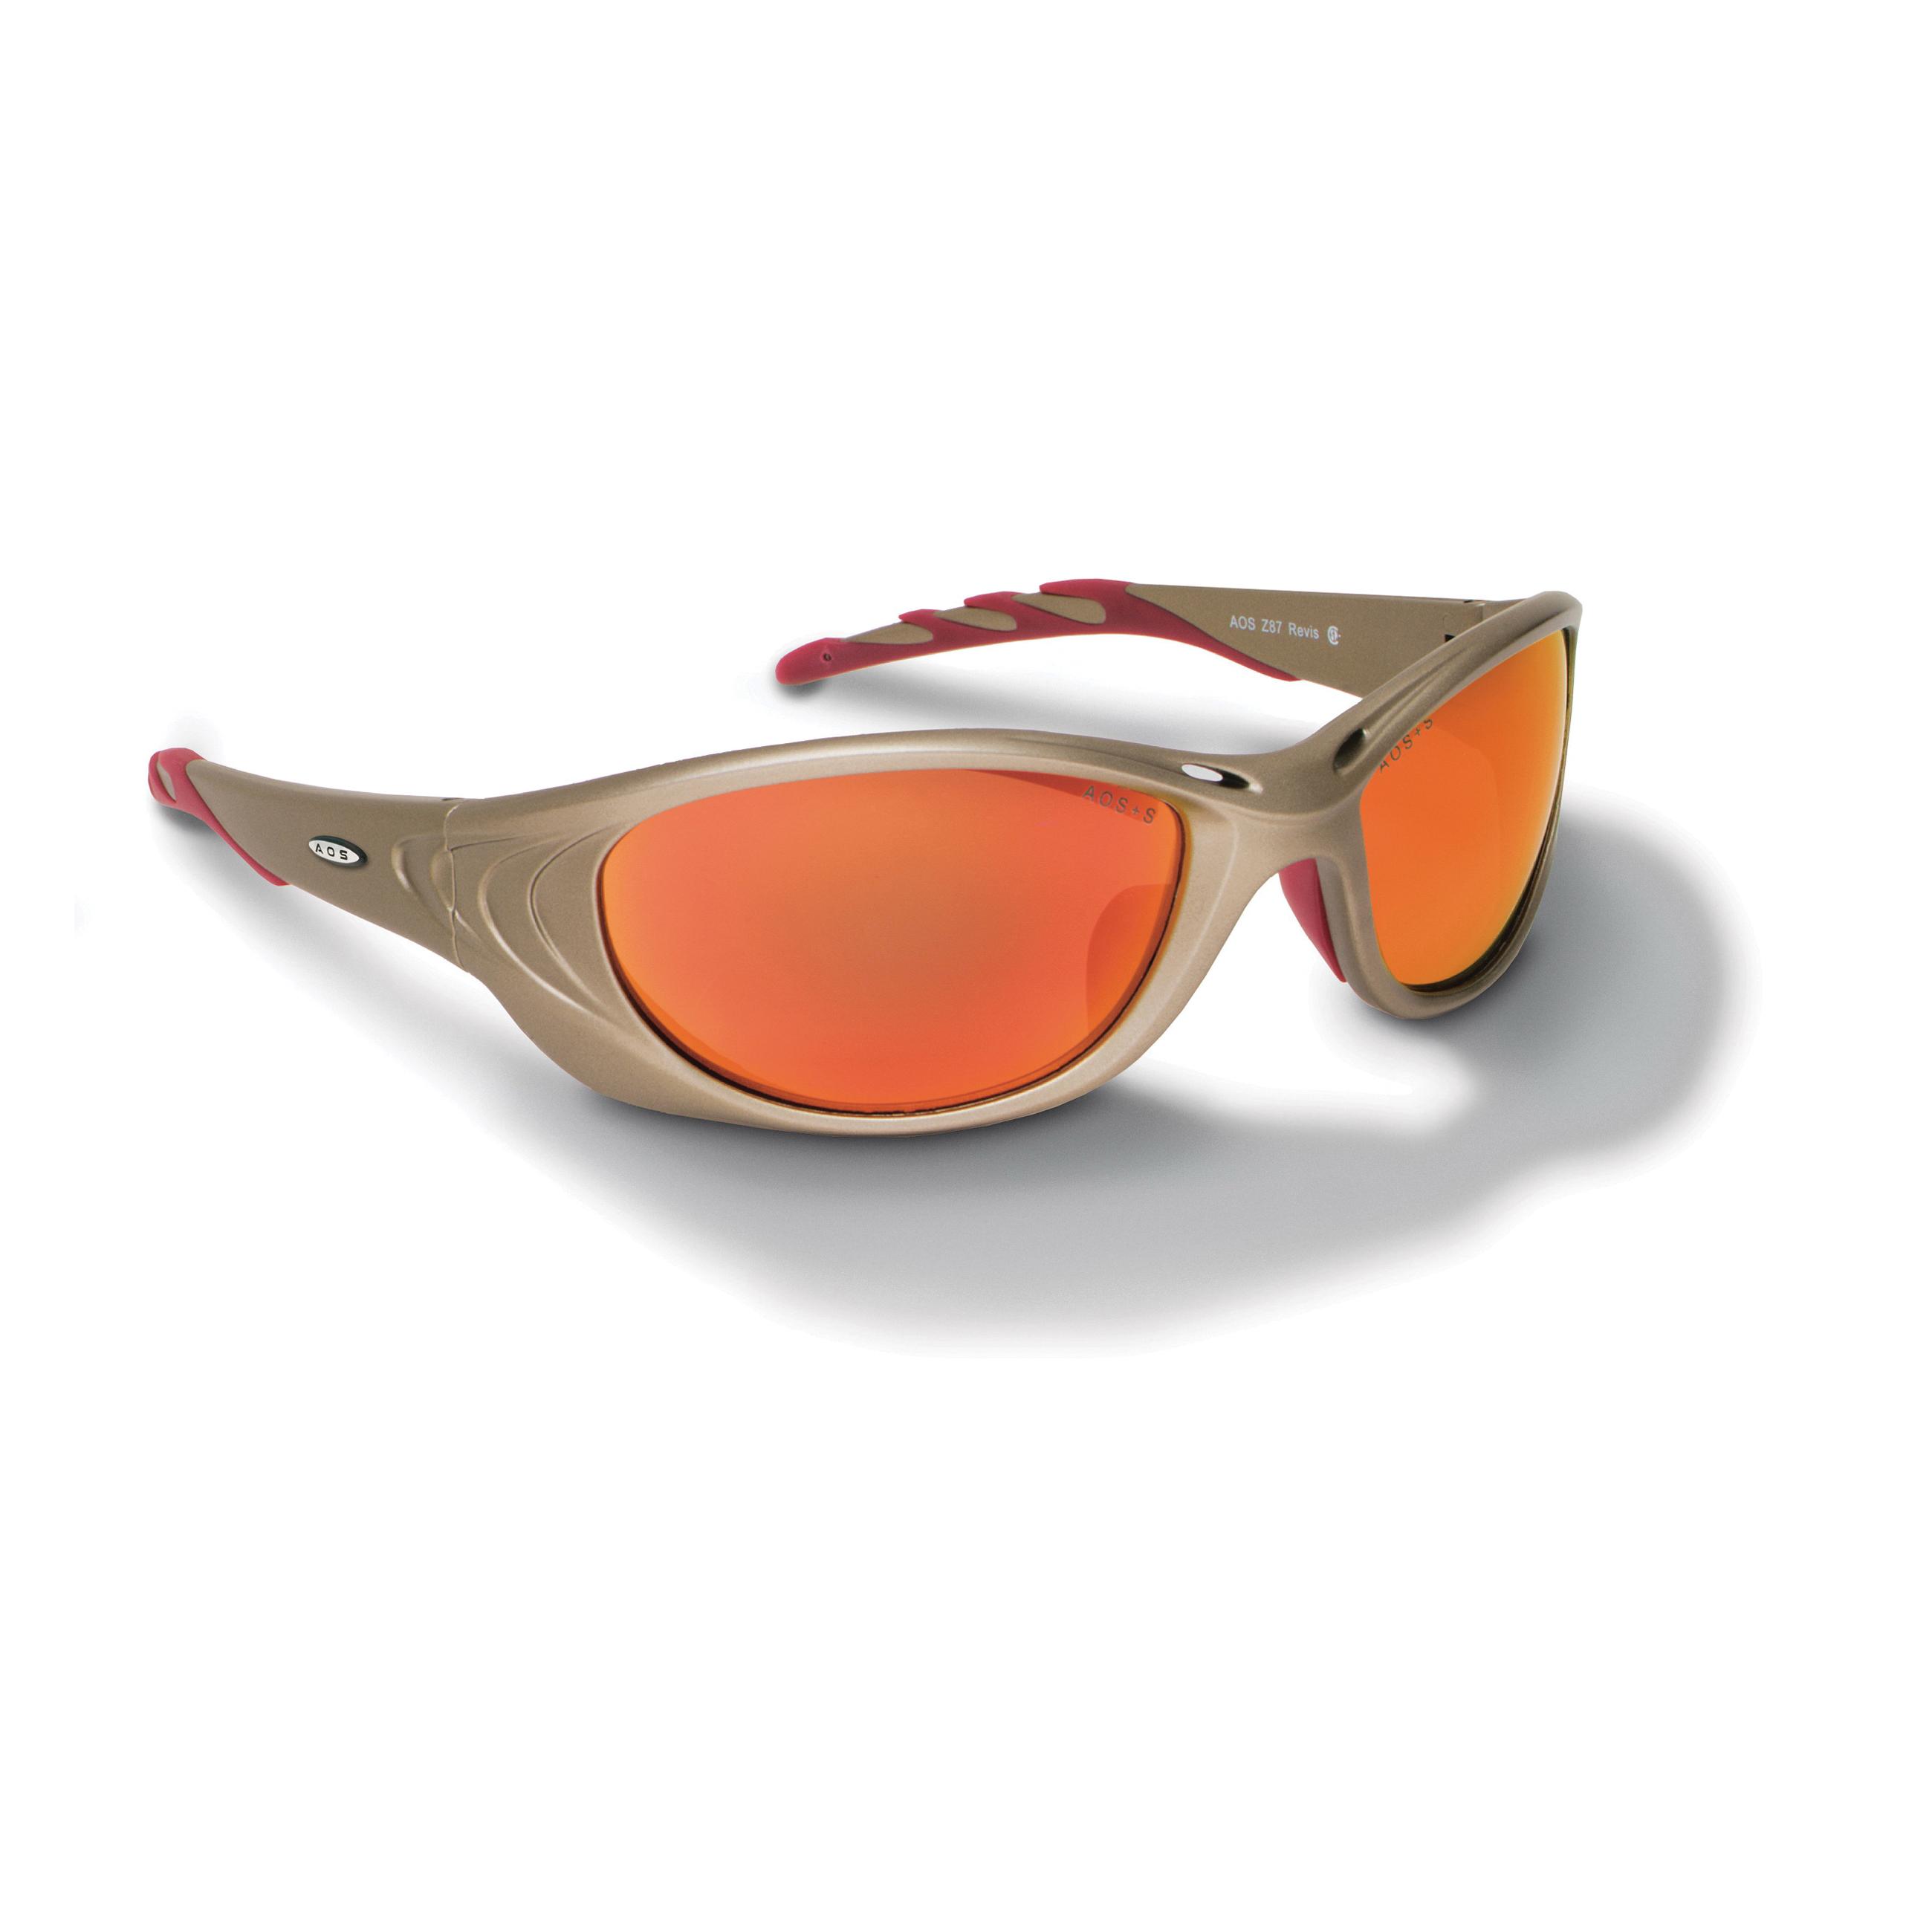 3M™ Fuel™ 078371-62153 2 Series Premium Protective Eyewear, Anti-Scratch, Red Mirror Lens, Full Framed Frame, Metallic Sand, Plastic Frame, Polycarbonate Lens, ANSI Z87.1-2015, CSA Z94.3